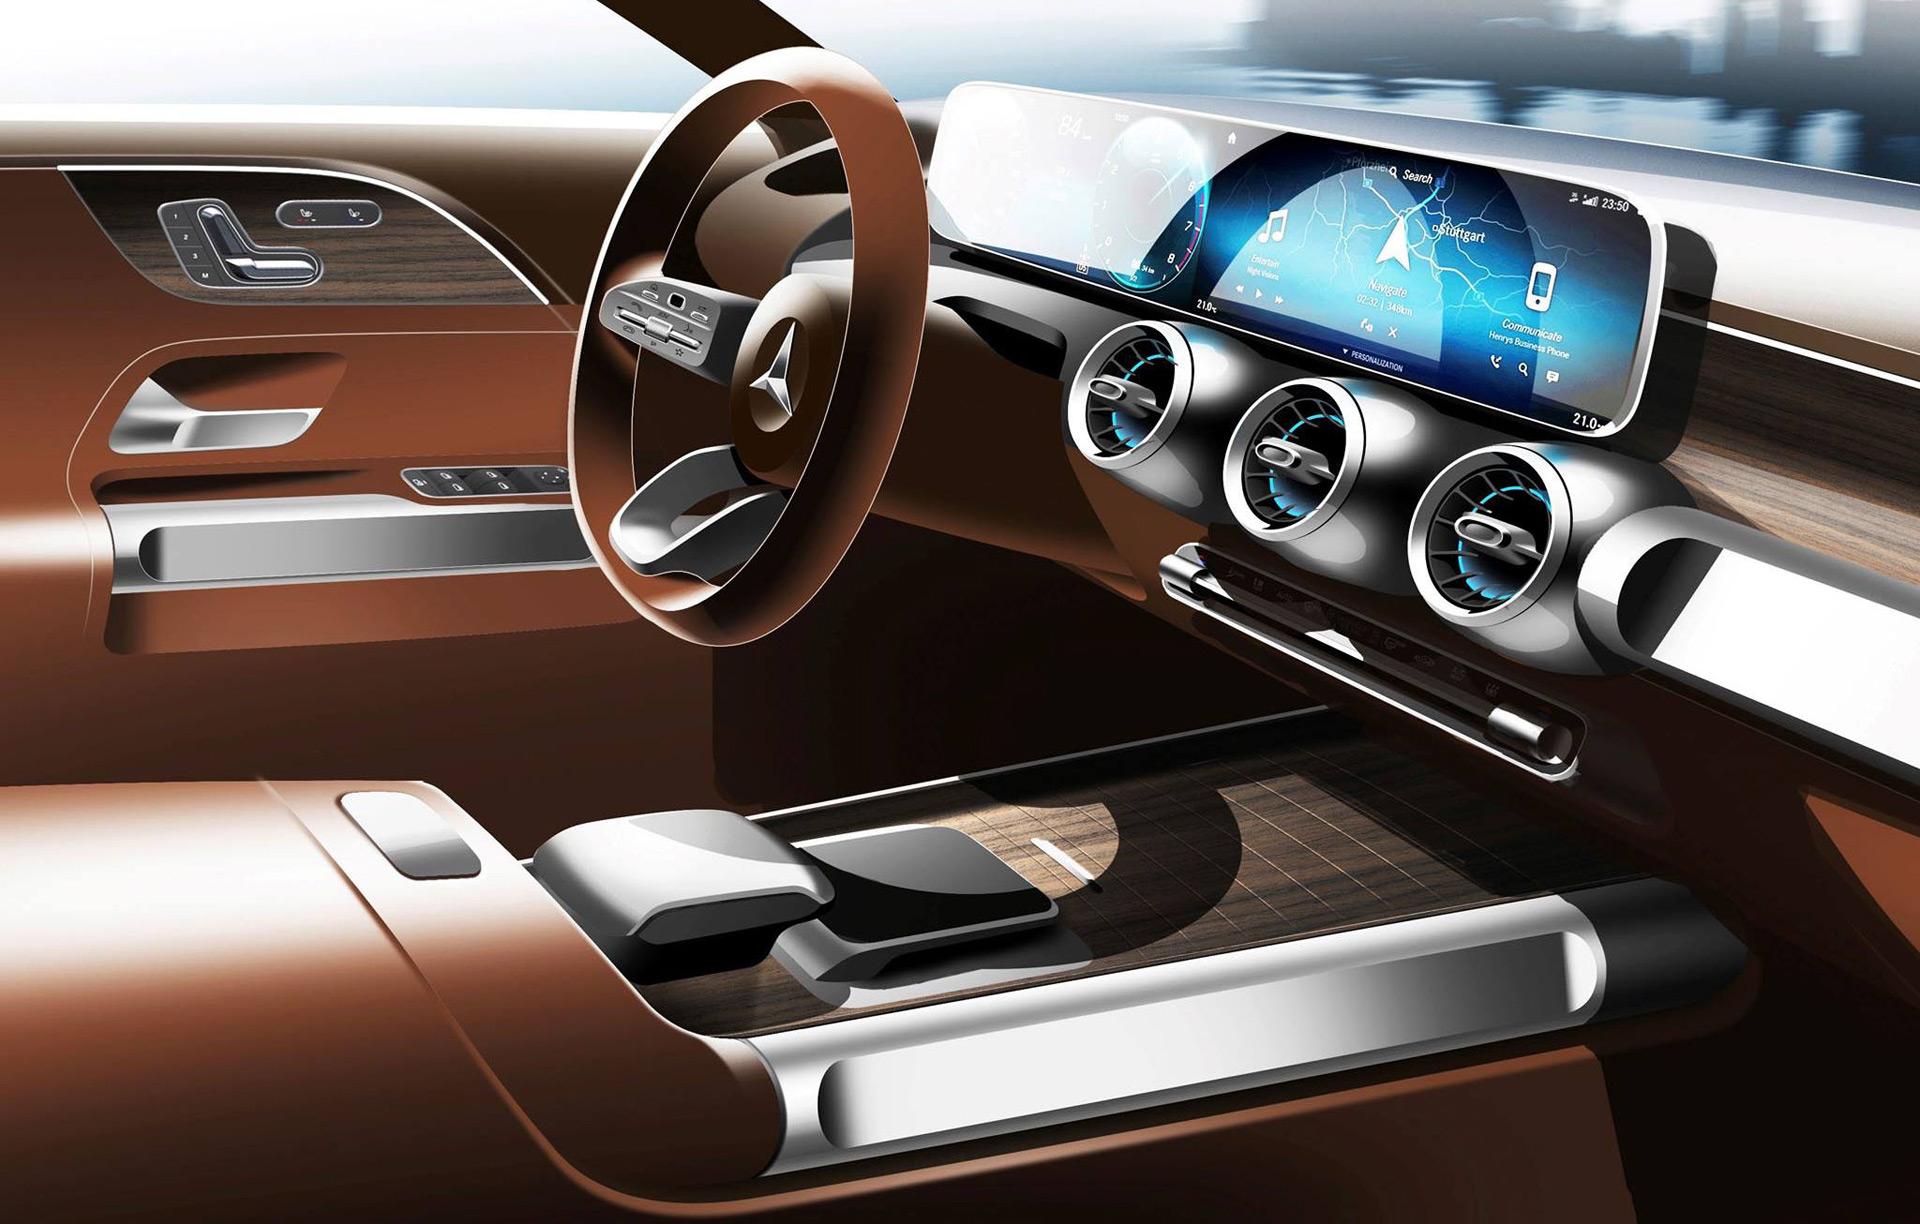 Mercedes GLB concept confirmed for 2019 Shanghai auto show